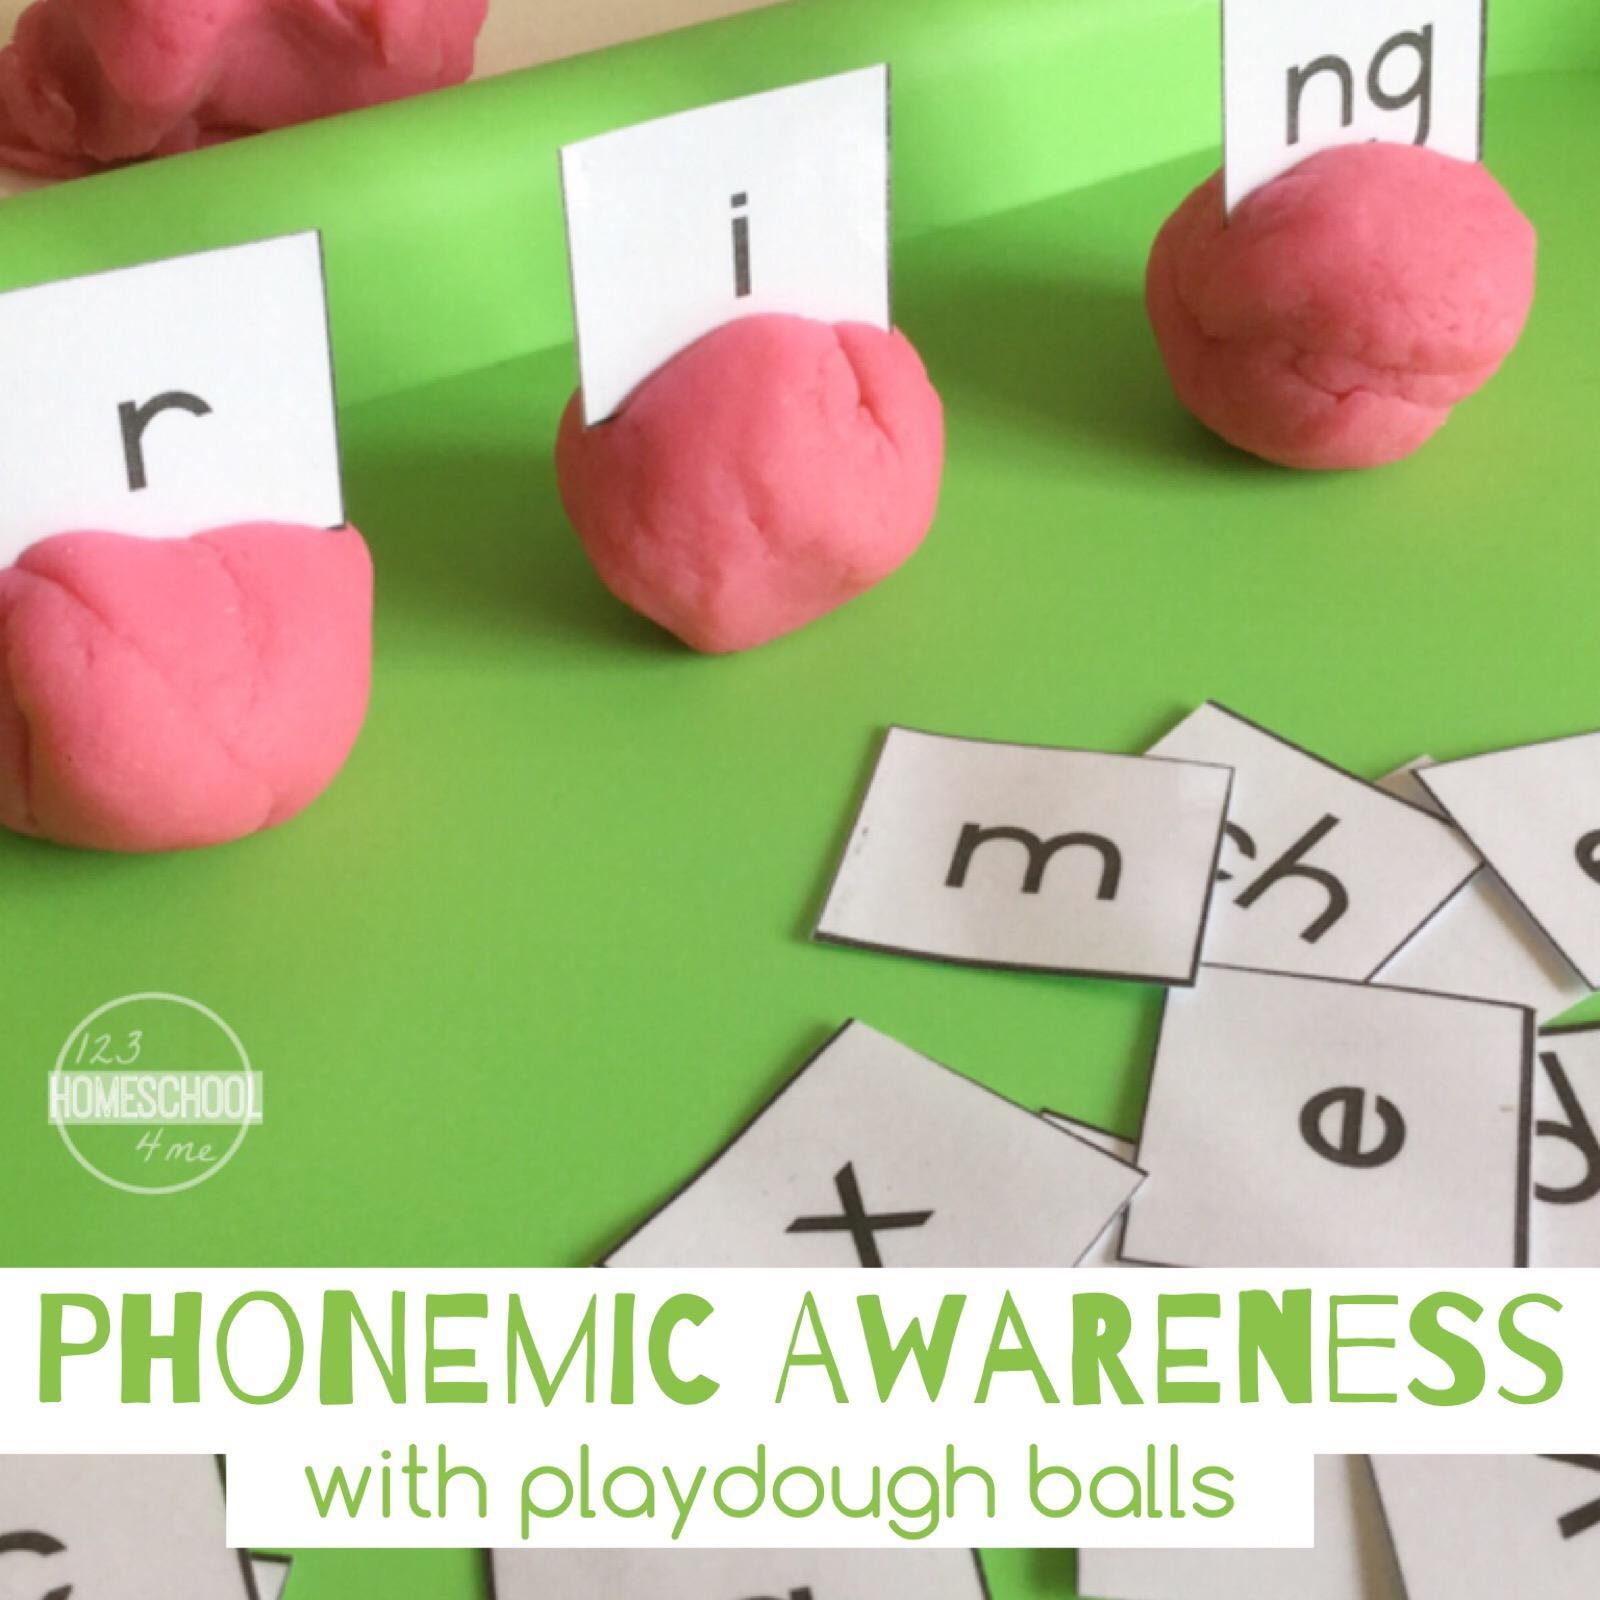 Worksheet Preschool Phonemic Awareness Activities phonemic awareness with playdough balls make learning fun this kids activity